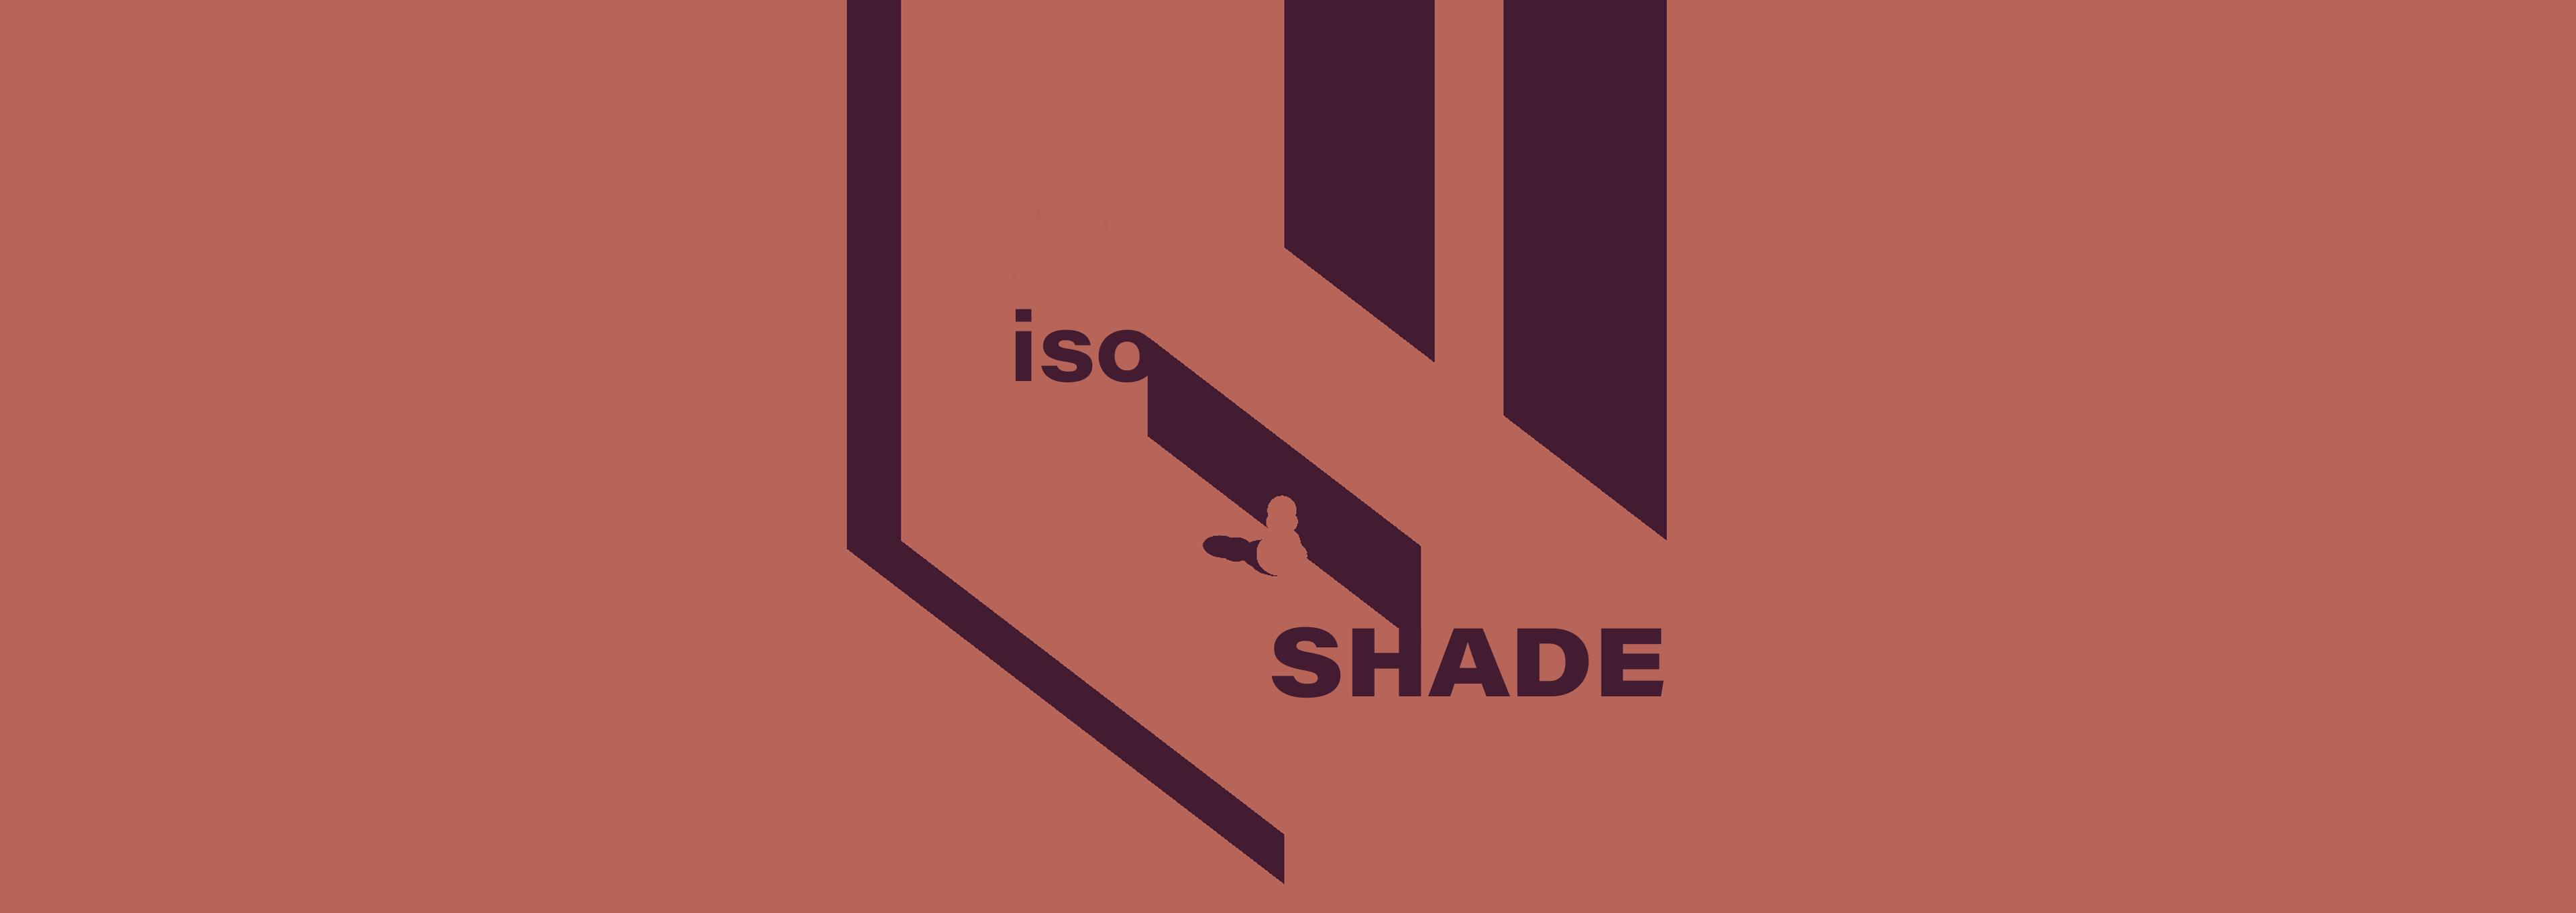 isoSHADE